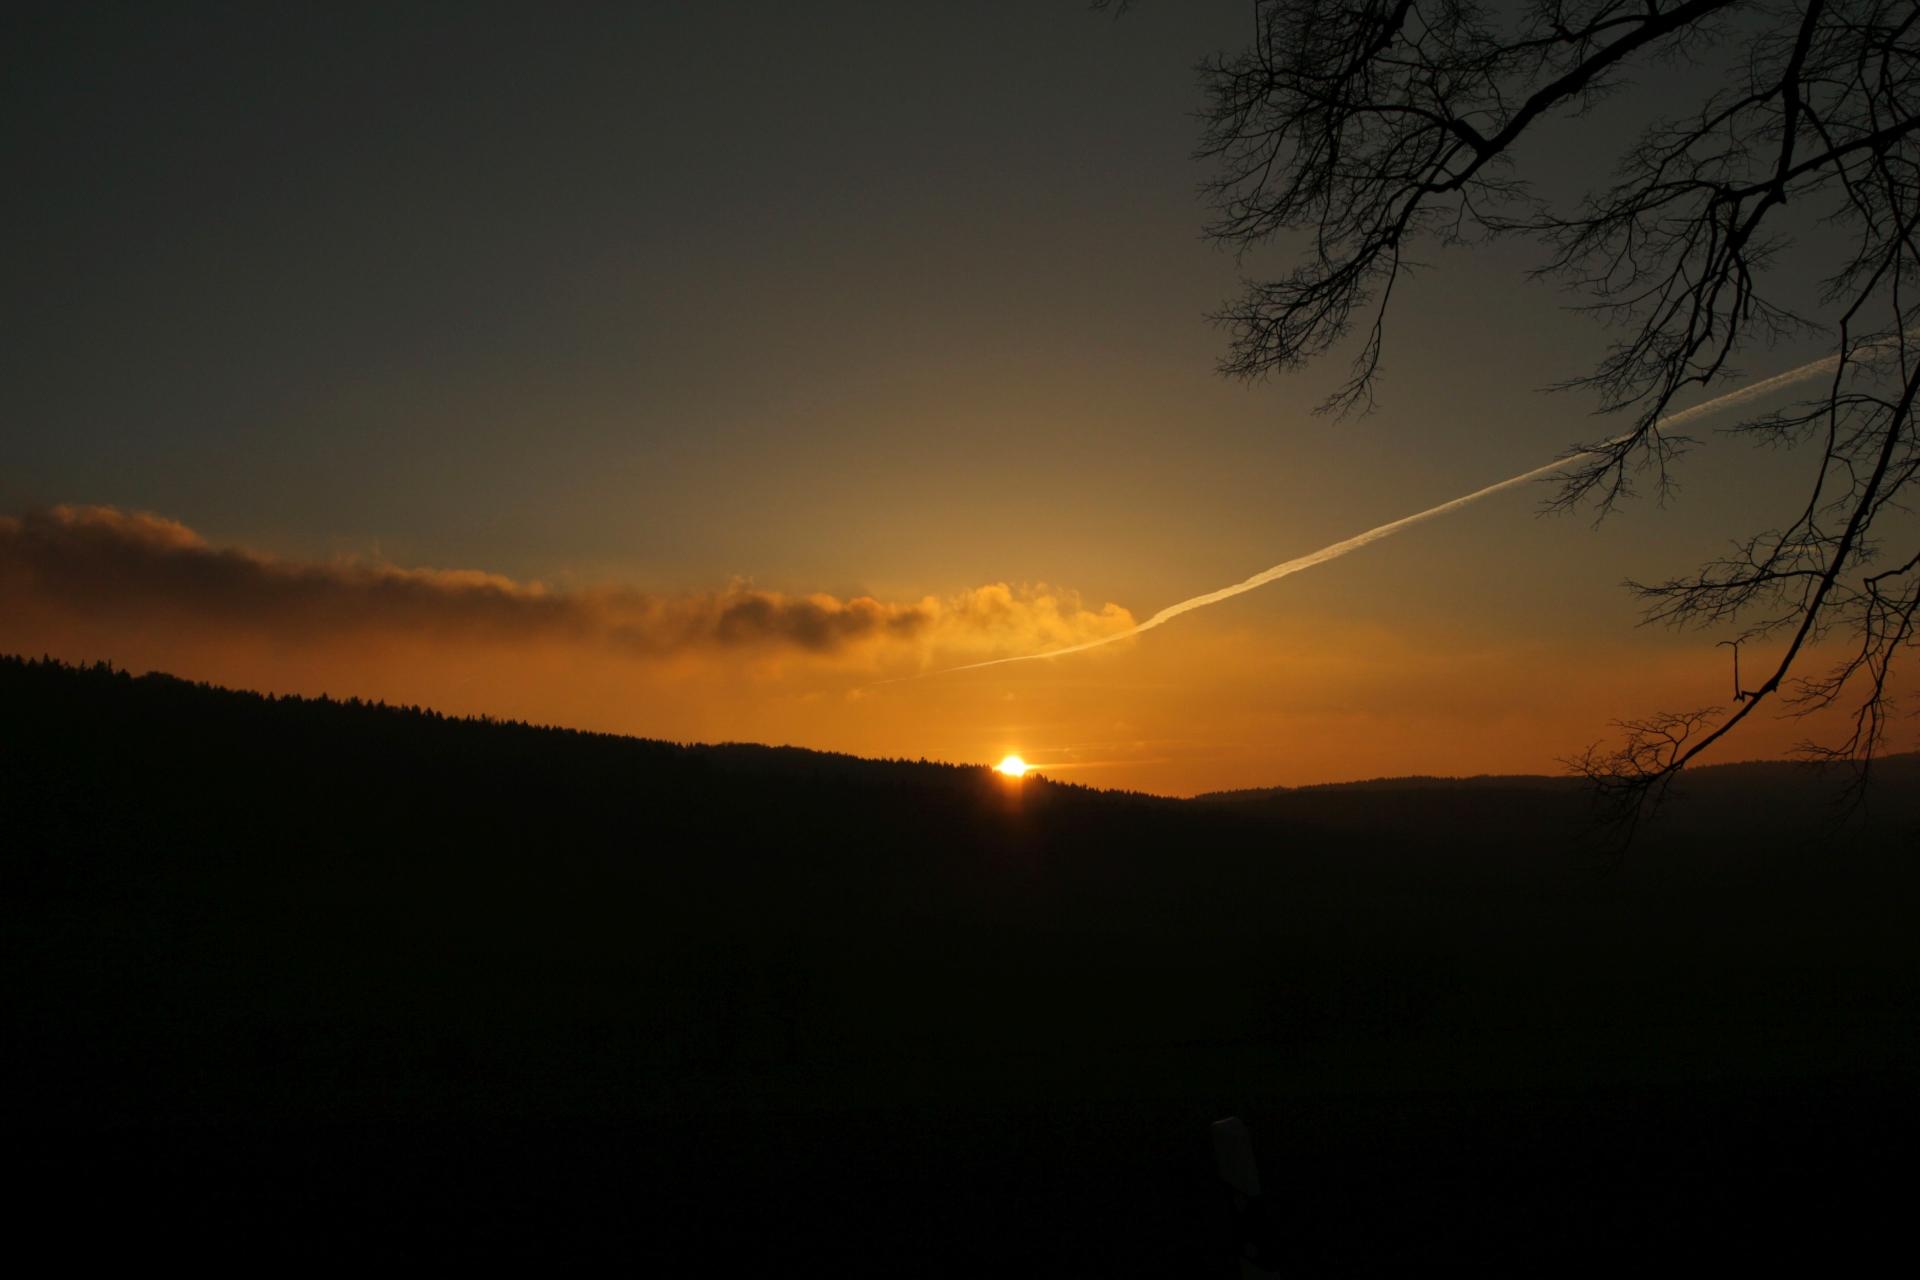 Sundown by LoveForDetails